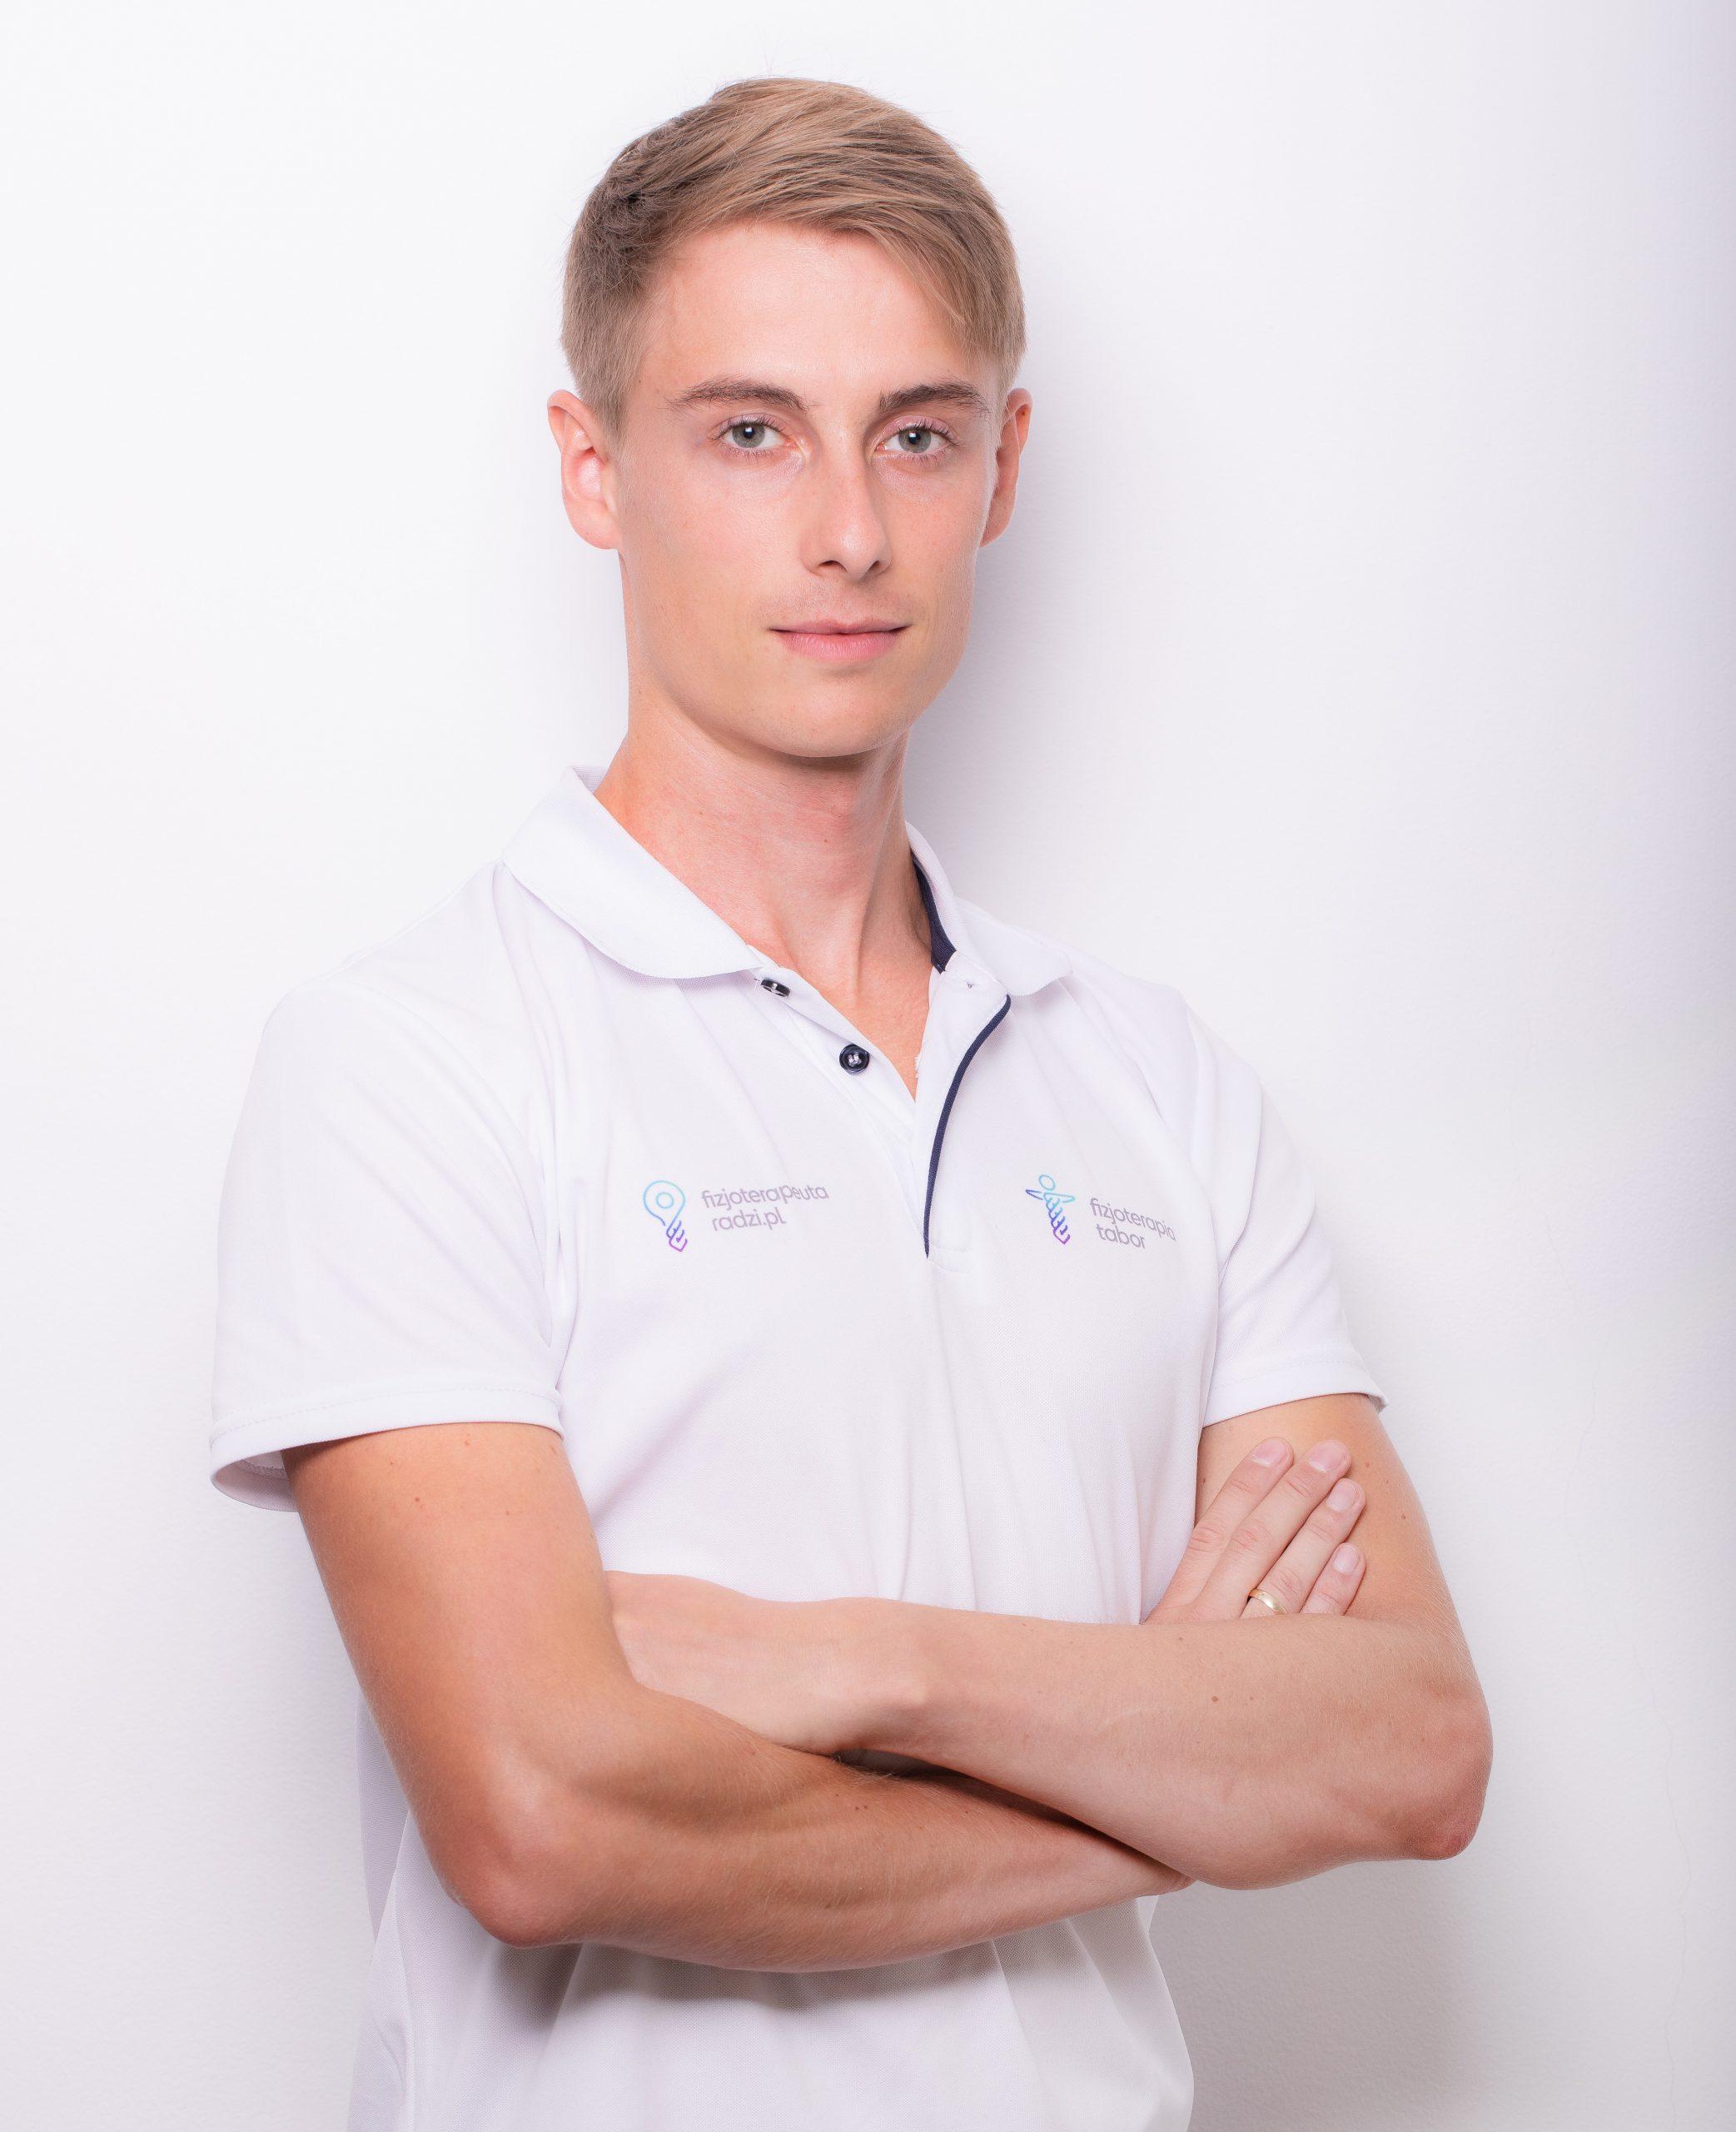 Dominik Tabor, fizjoterapeuta, osteopata